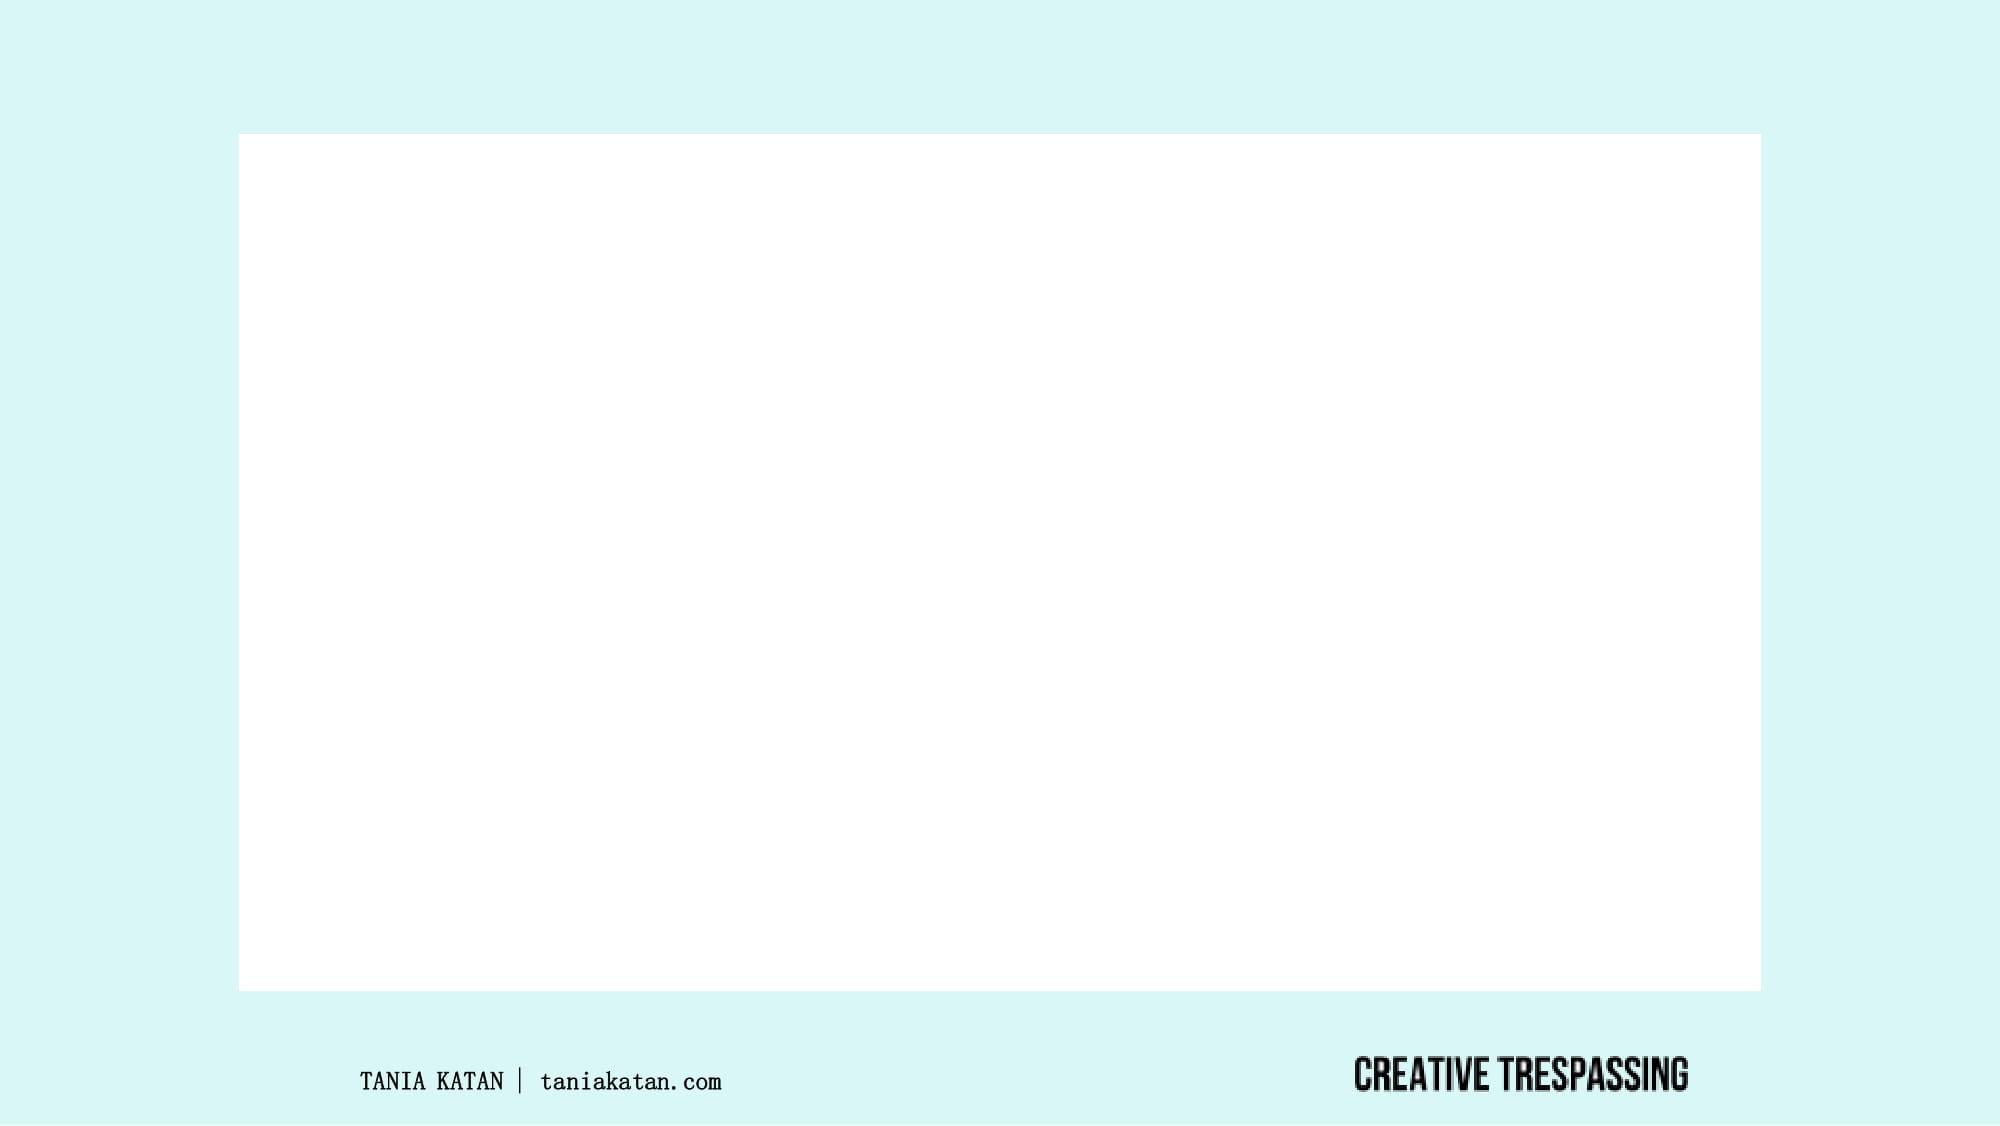 Creative Trespassing (27)